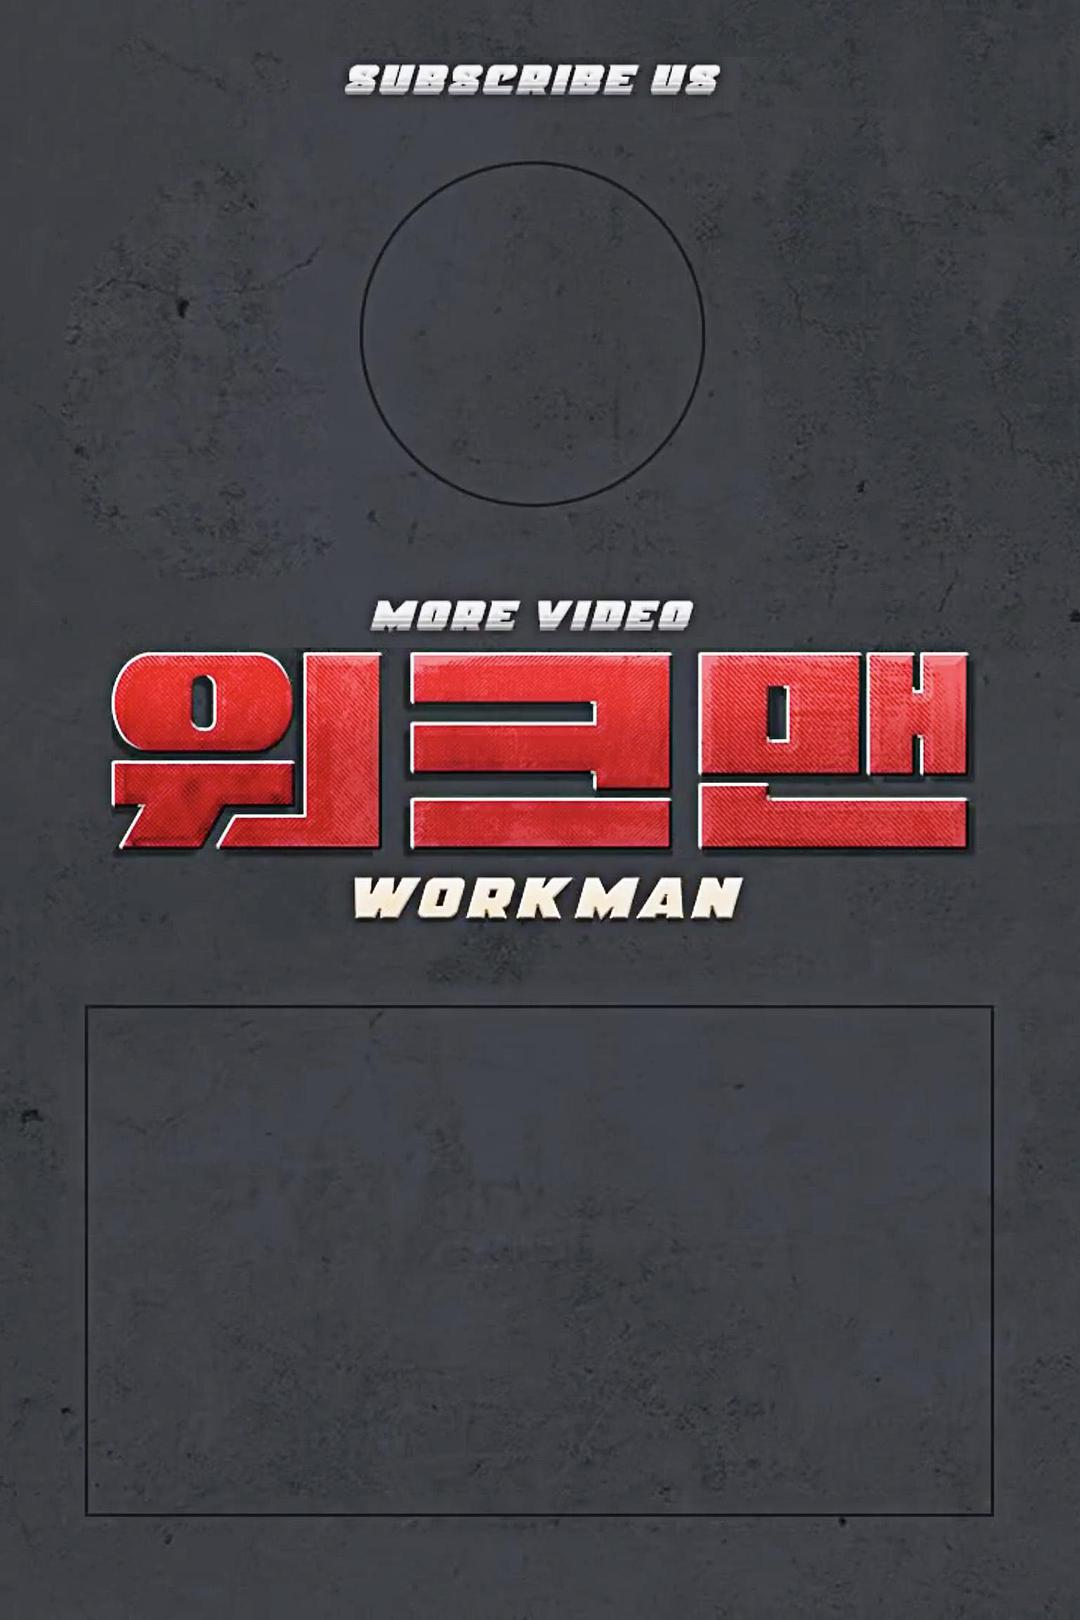 Workman 2021